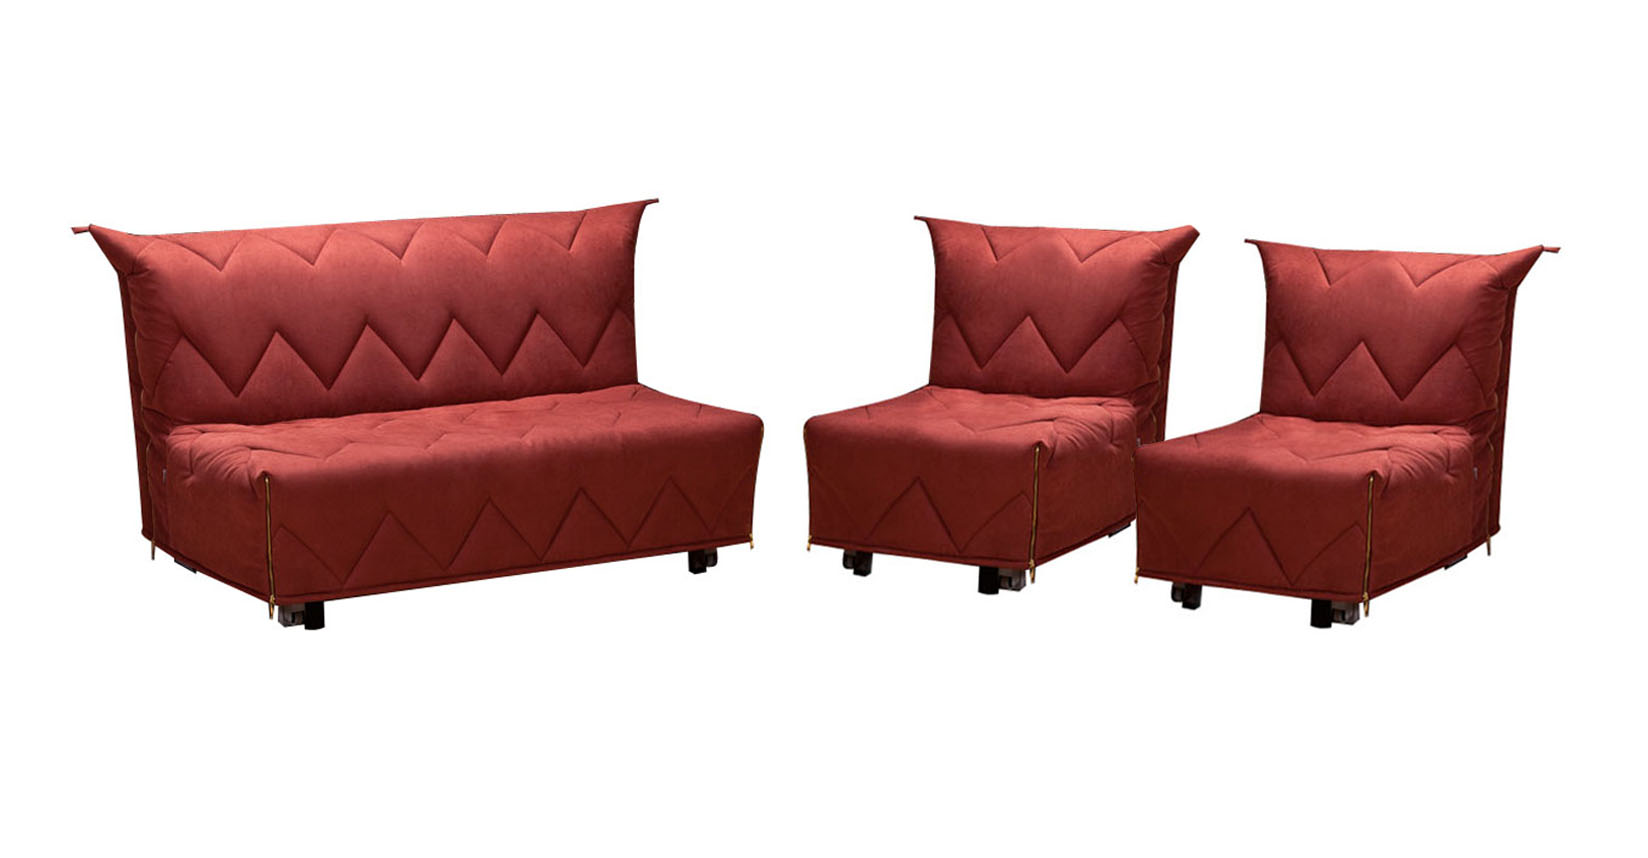 Комплект мягкой мебели Фламинго